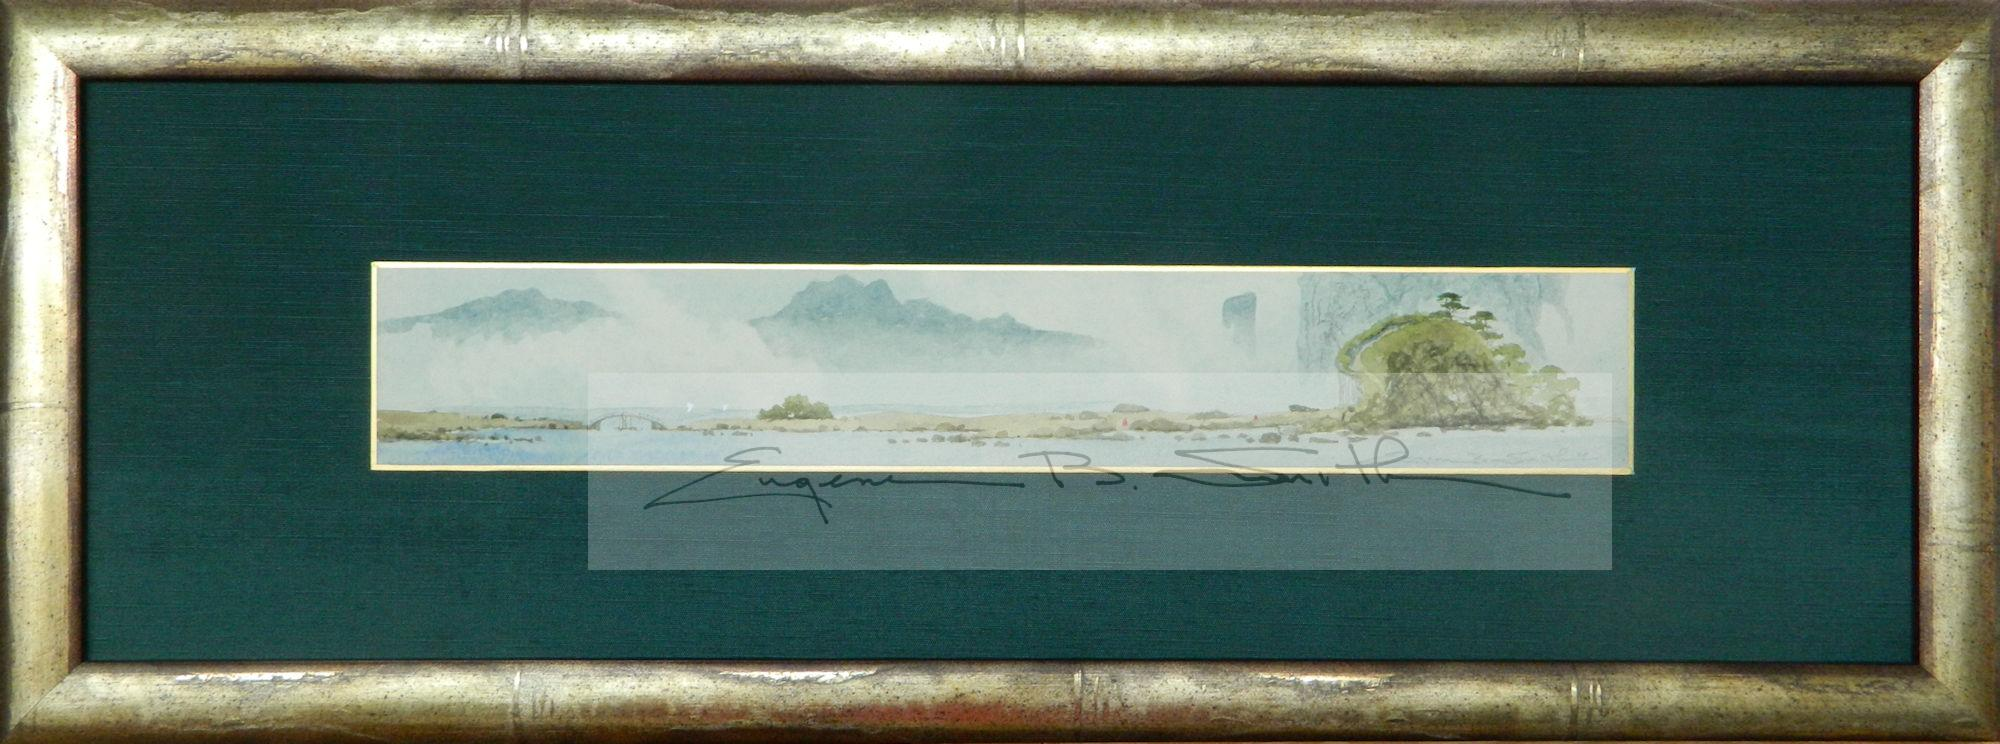 Meditation | Single Panel Tanzaku | Frame size: 7 x 21 | Call for price